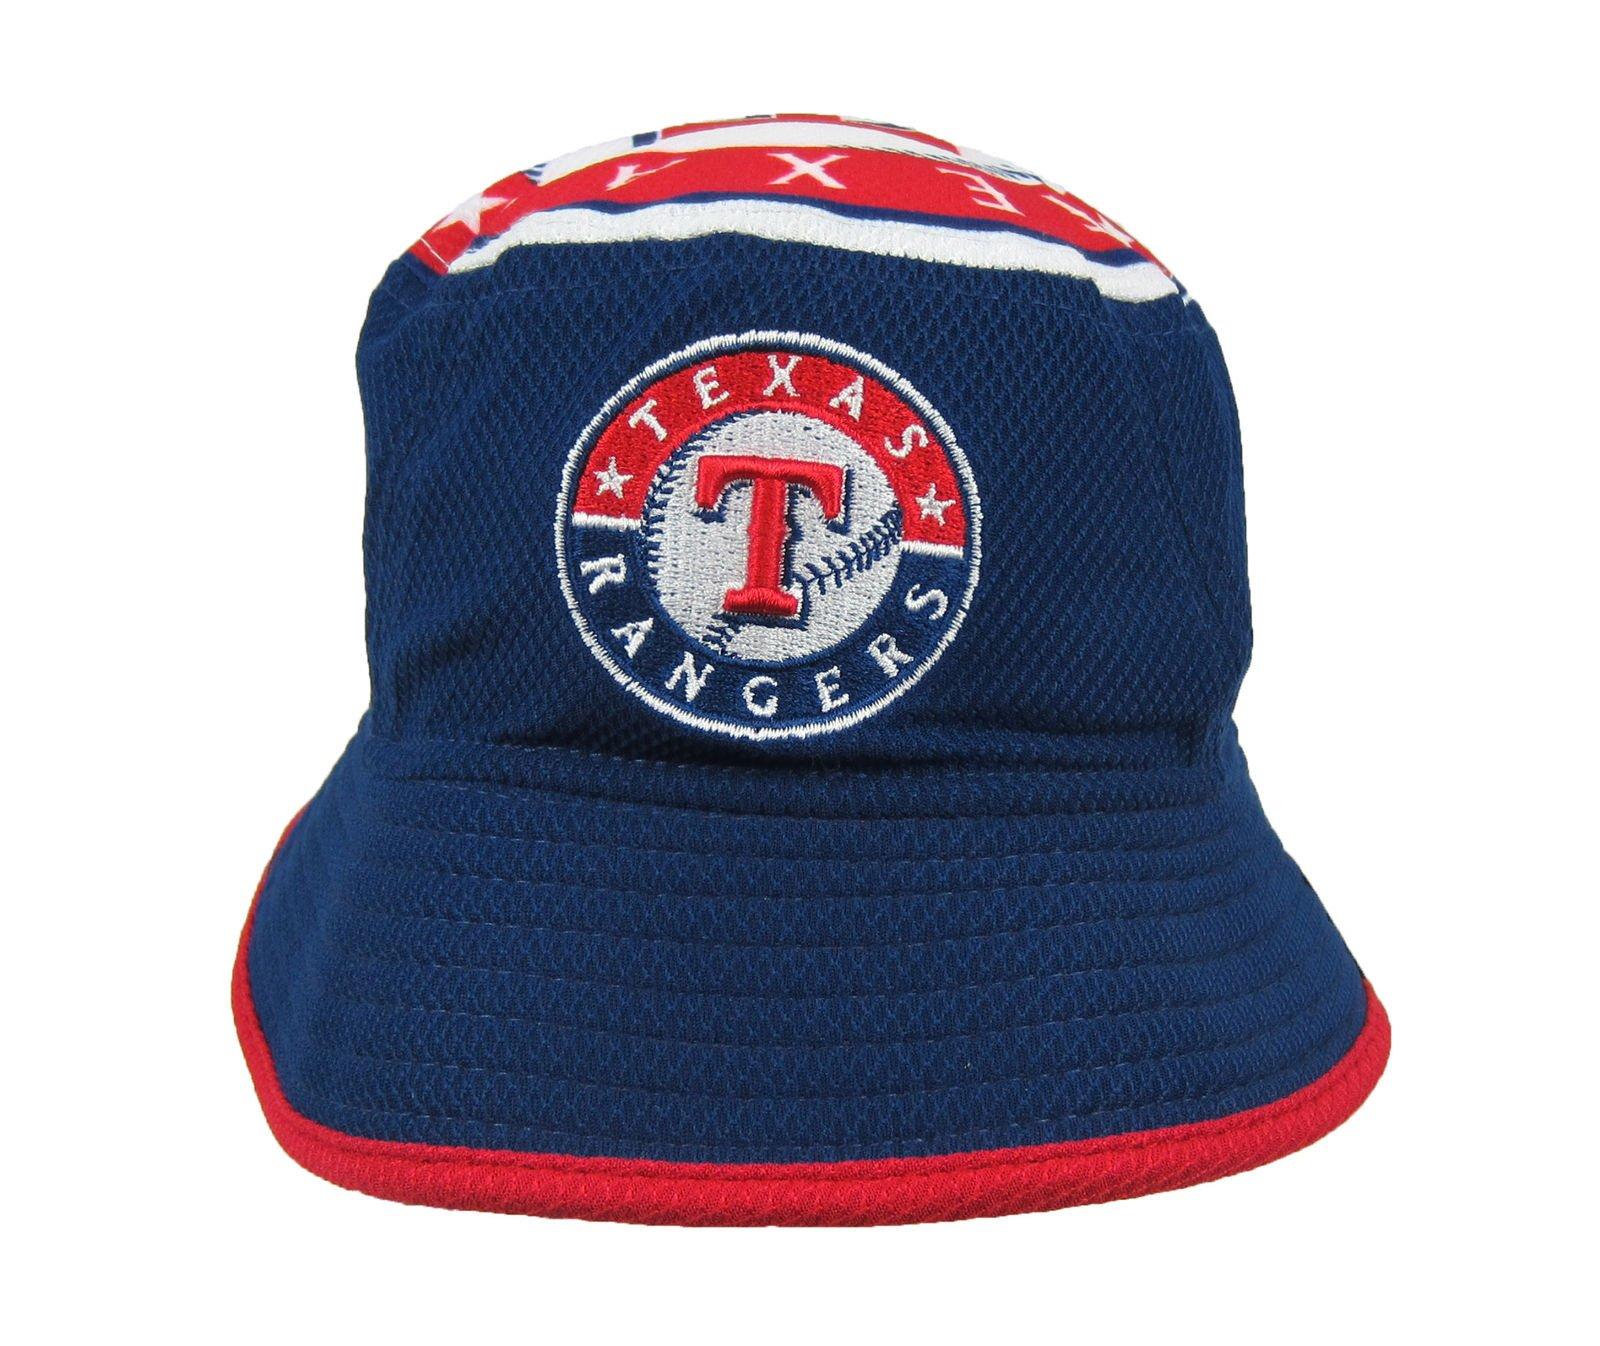 New Era Kids MLB Texas Rangers Bucket Hat Child-Youth One Size NWT ... 4ebb16c40cfb